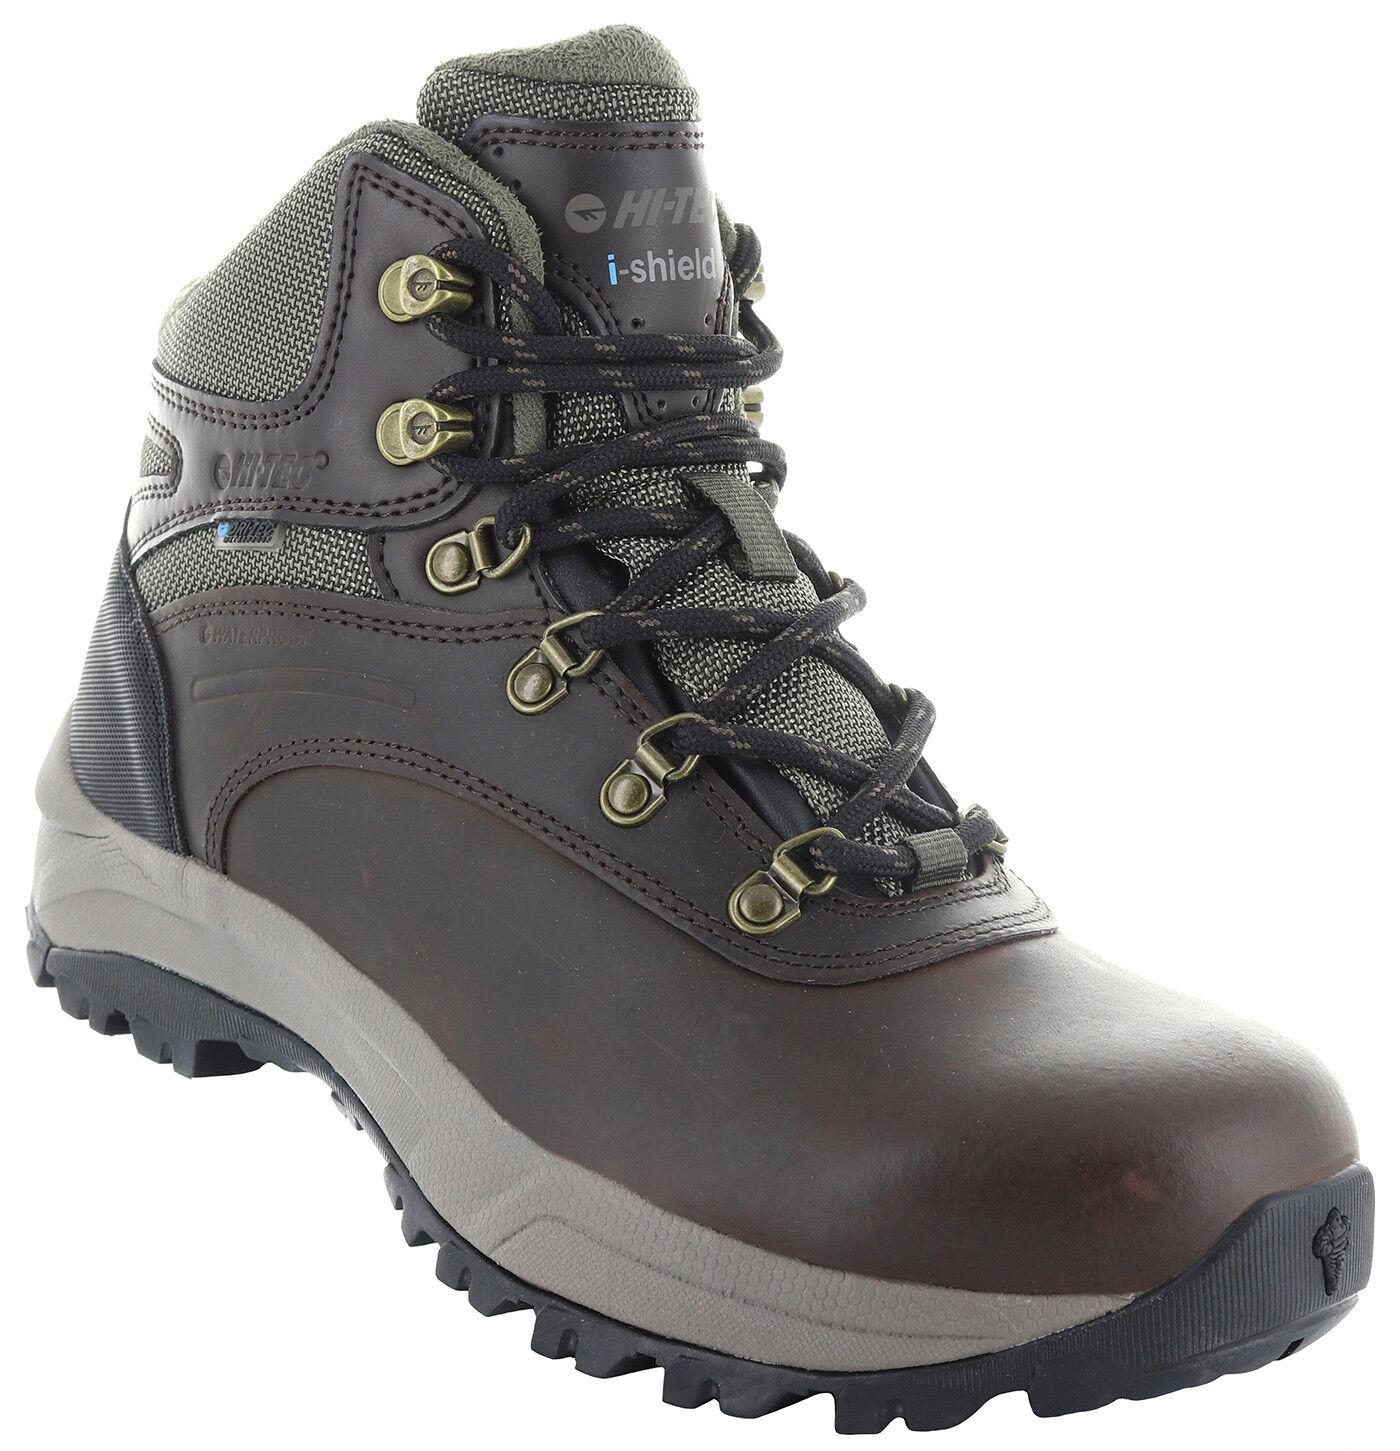 Hi-Tec 24115 Women's Altitude VI Brown Waterproof Leather High Top Hiking Boots